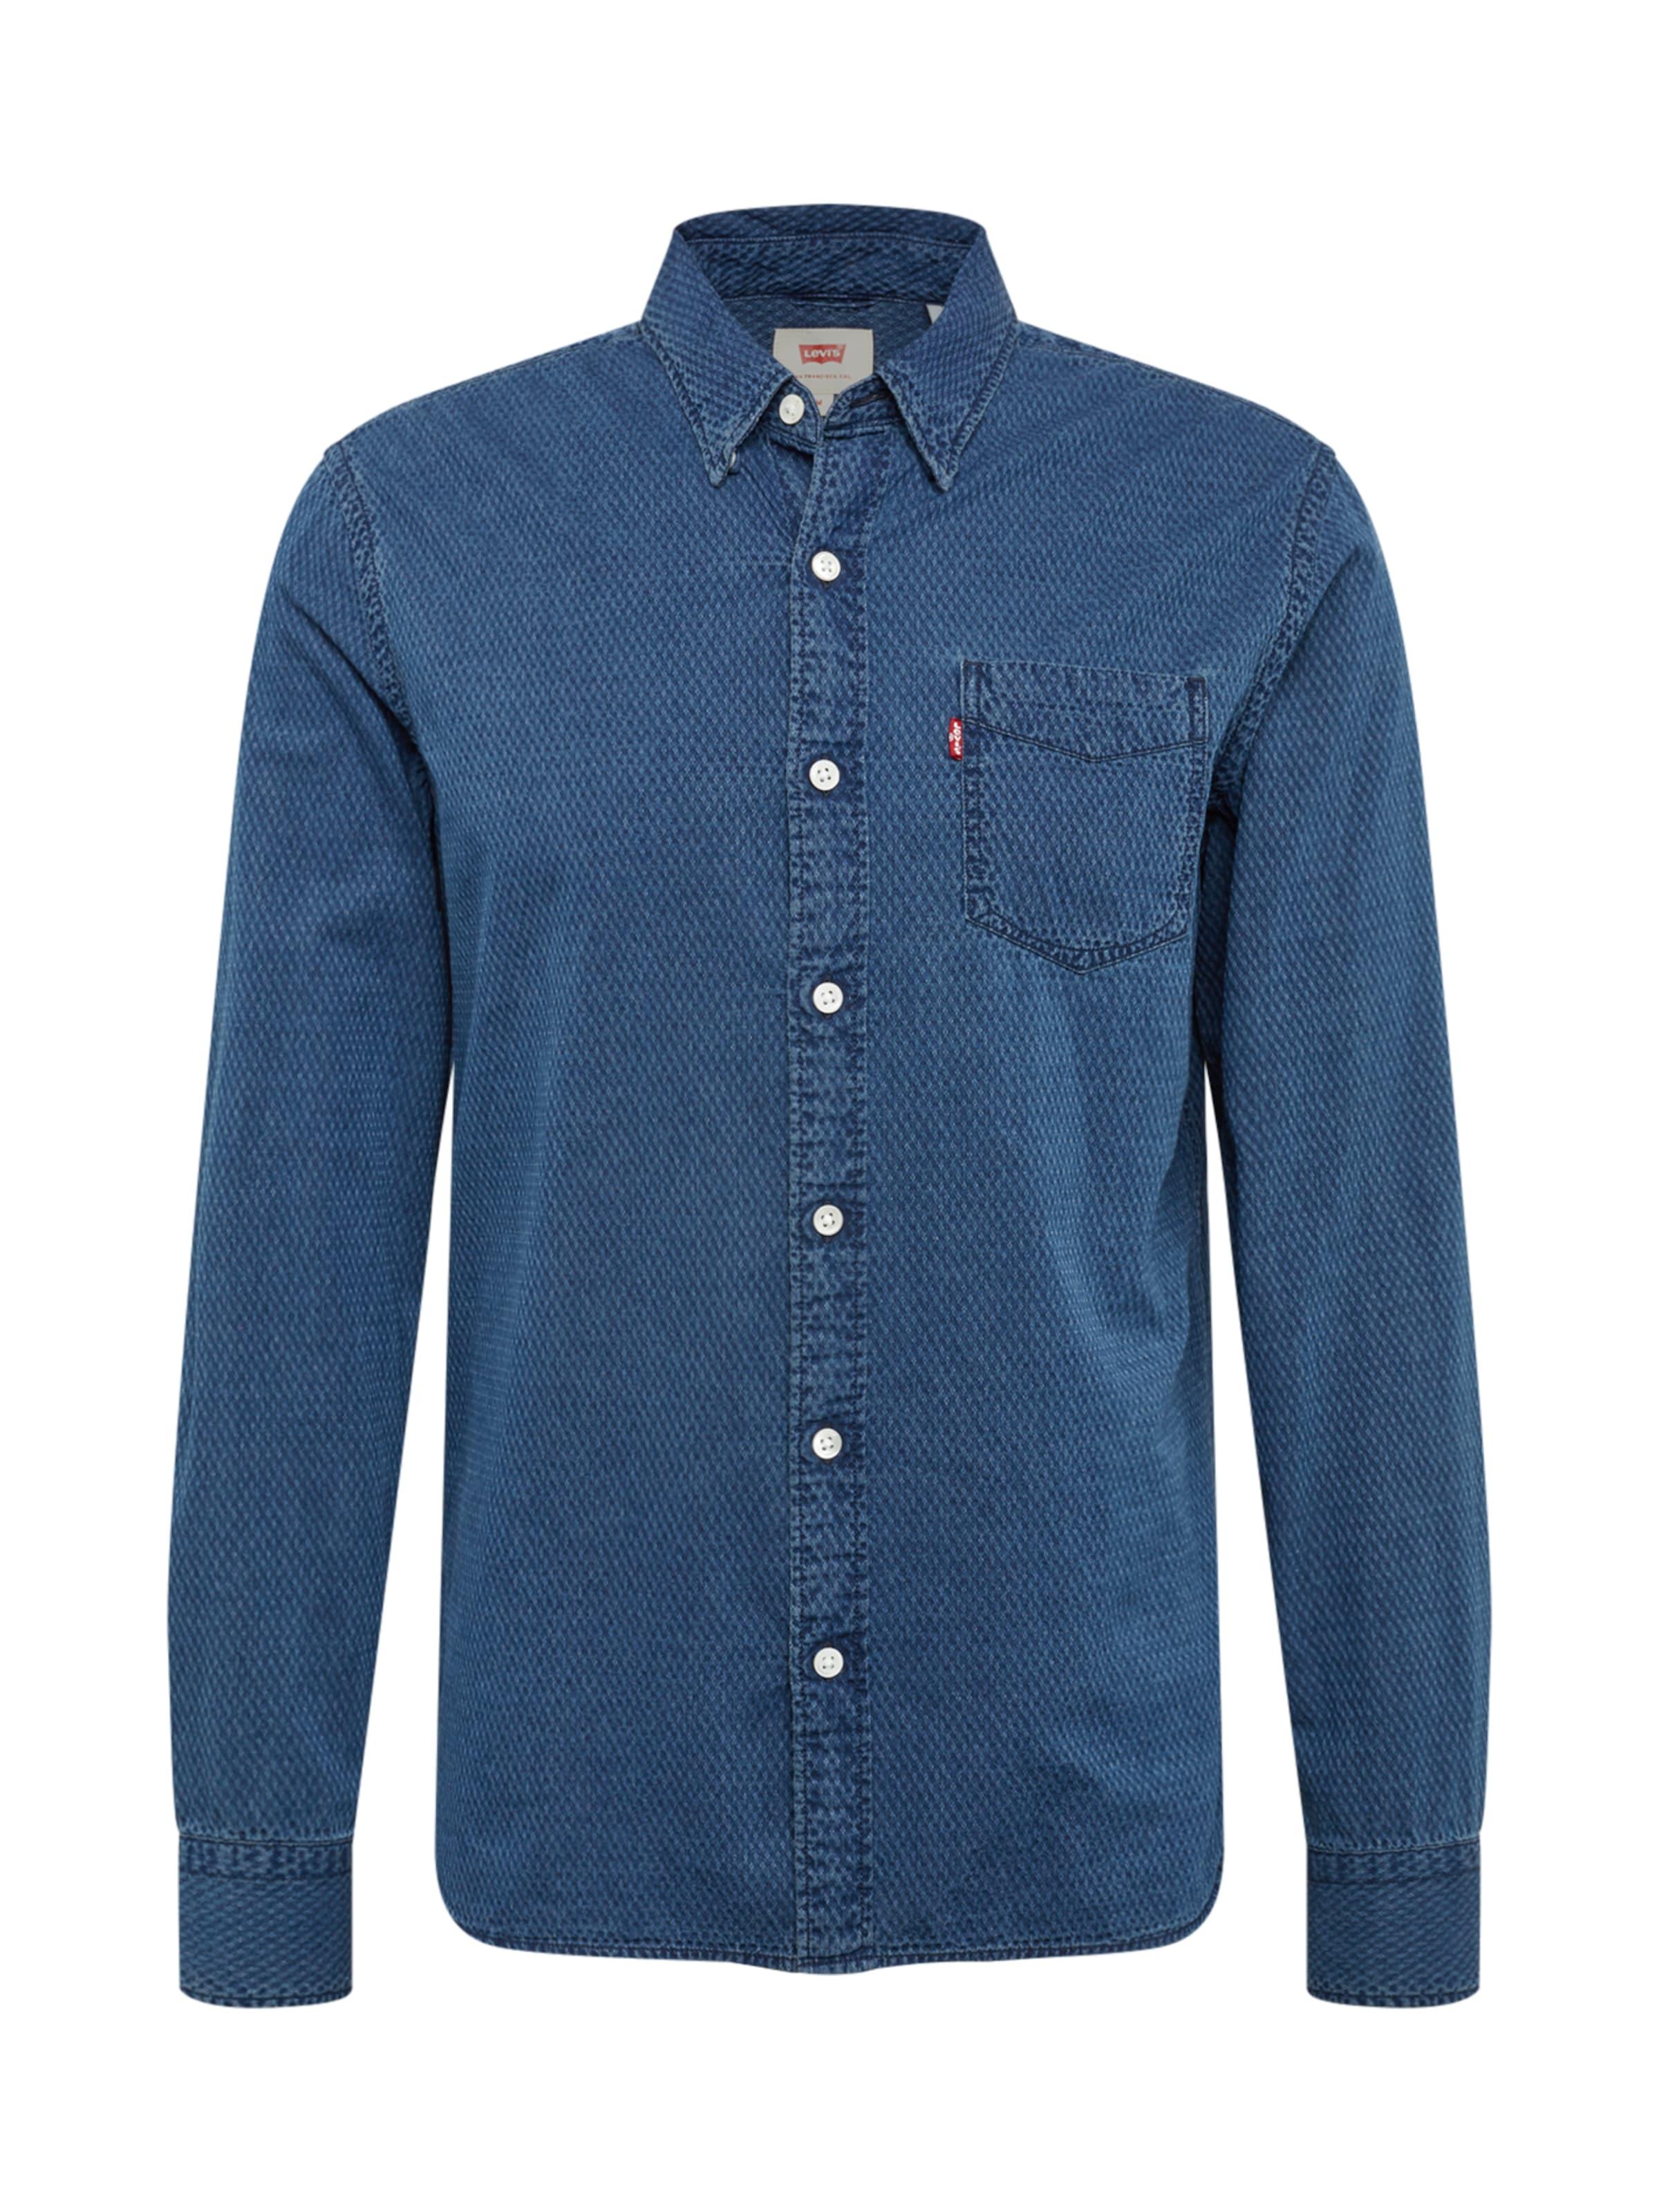 Levi's 'sunset1pocketshirt' Bleu Chemise Denim En cjRq35AL4